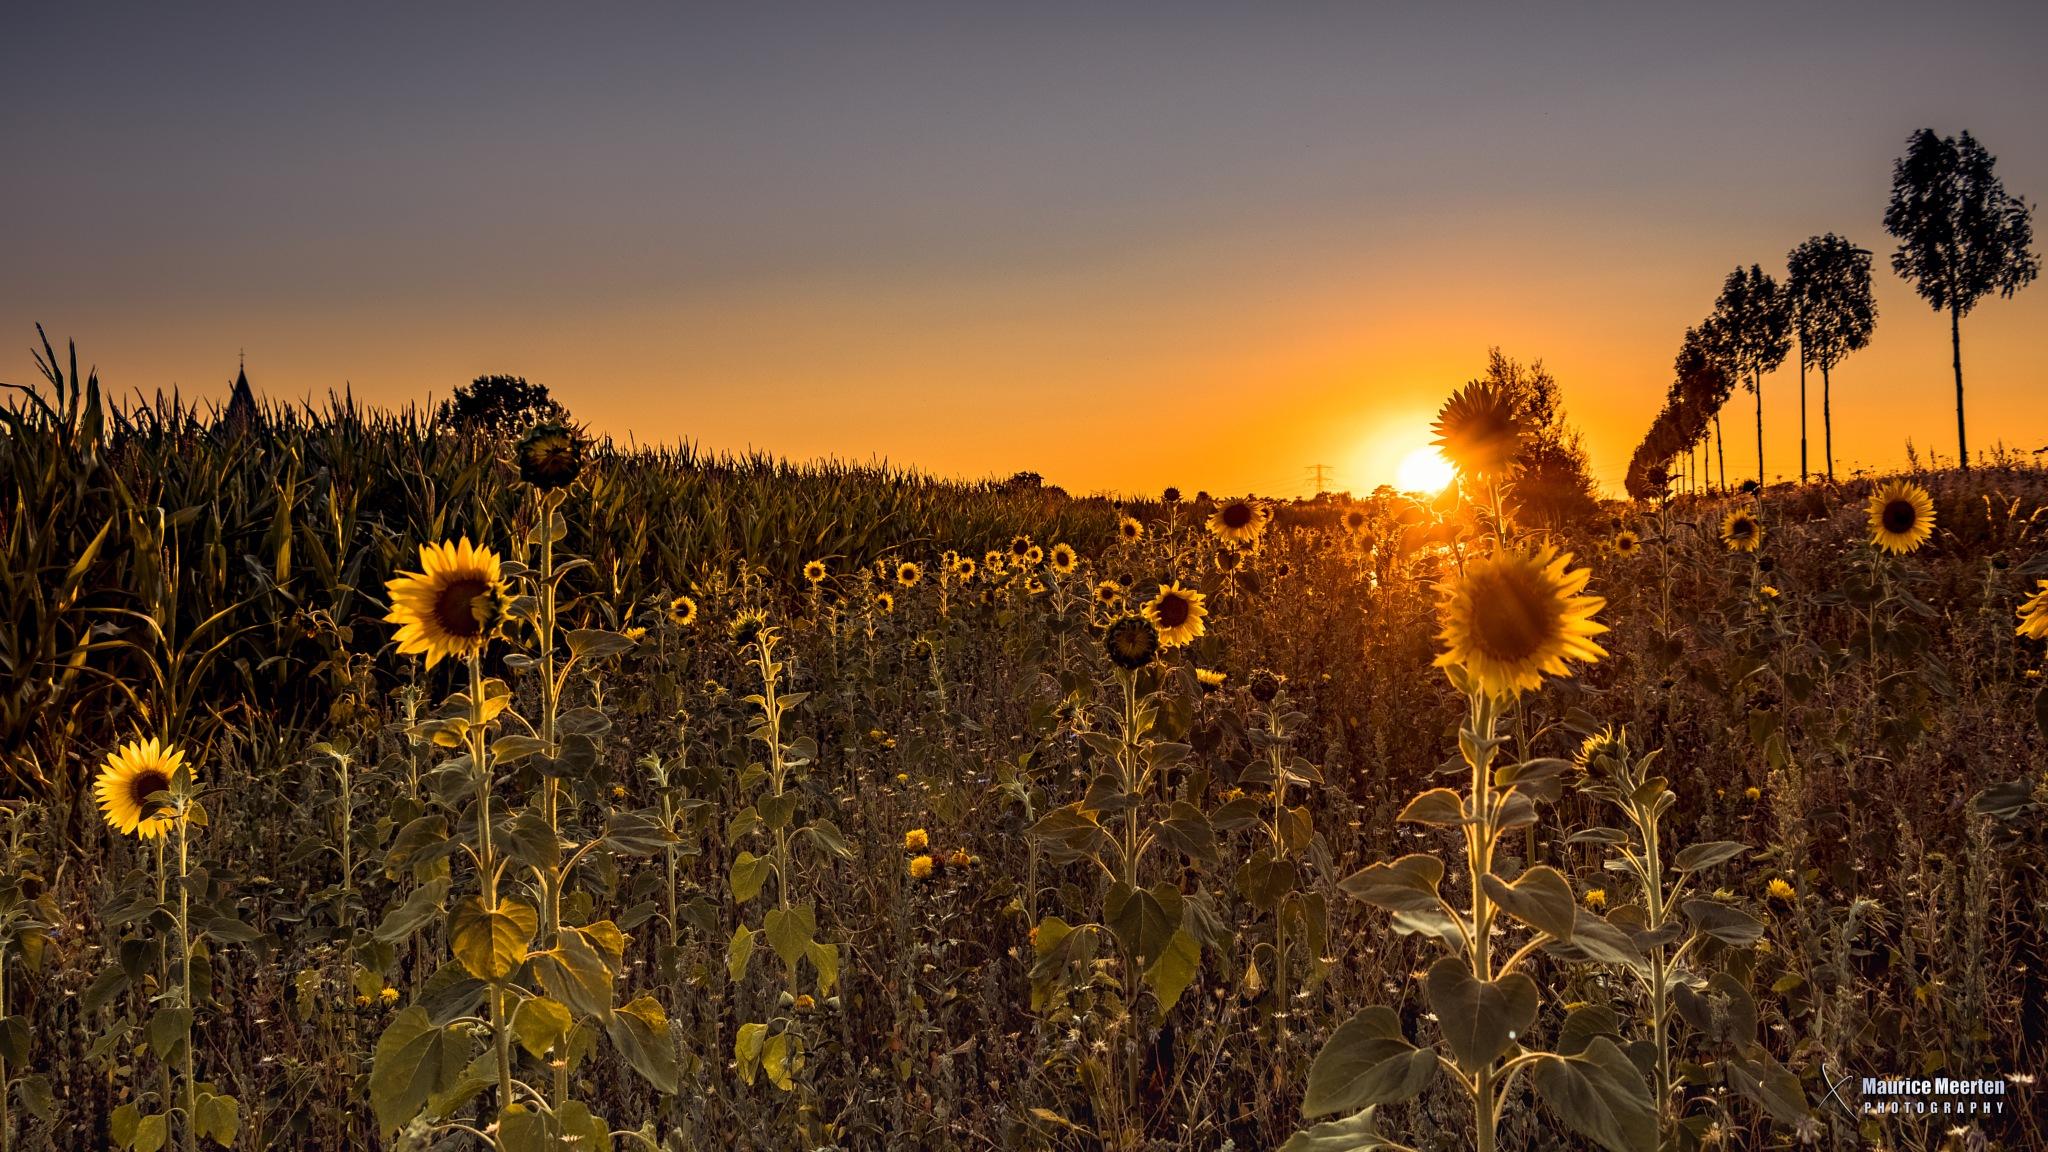 Sunflowers by Maurice Meerten